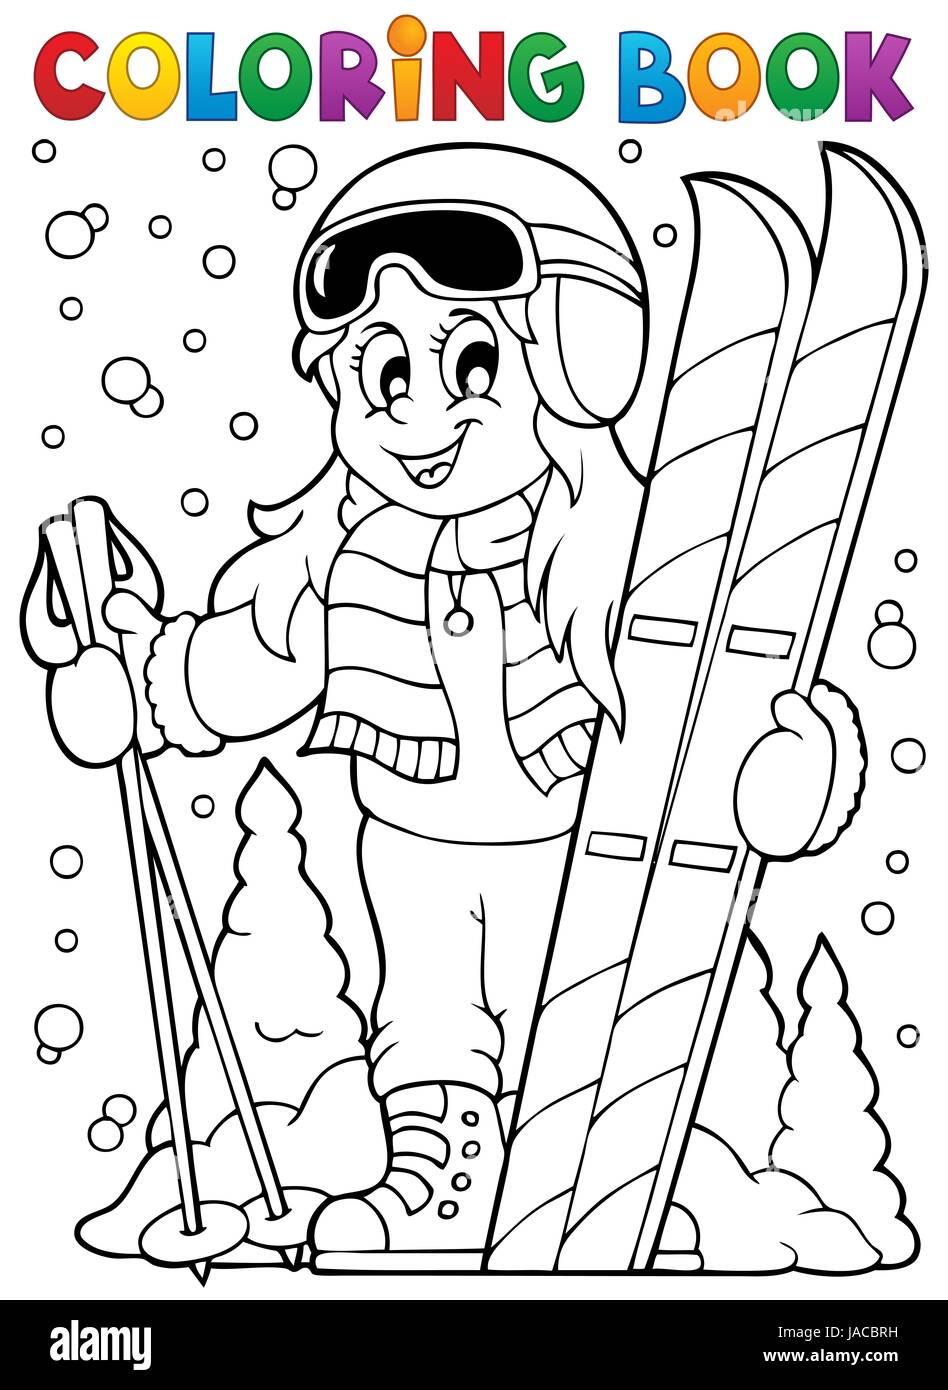 Cartoon Scarf Stockfotos & Cartoon Scarf Bilder - Seite 29 - Alamy